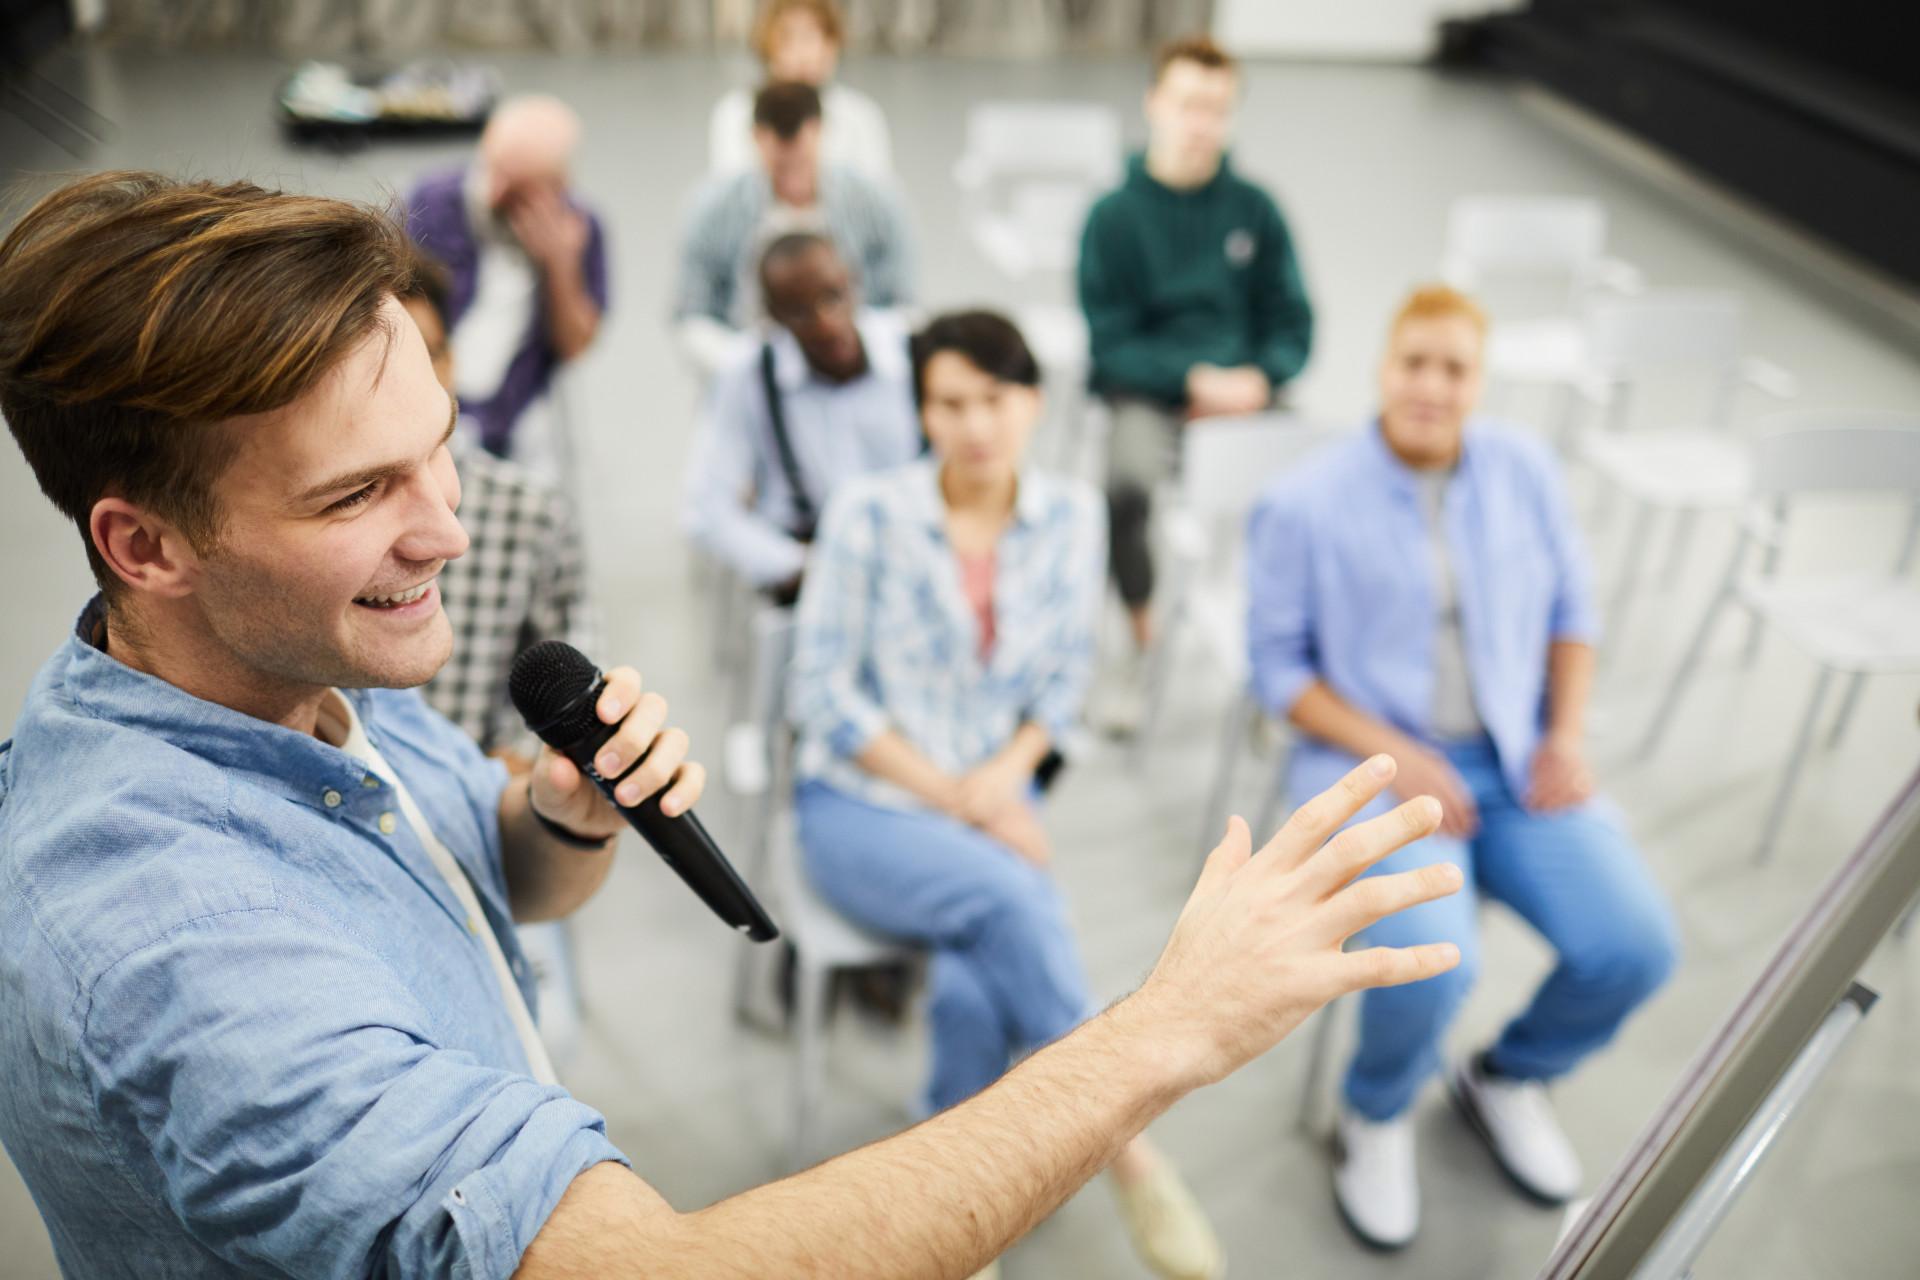 Book a professional for sales coaching with Eventeus.com